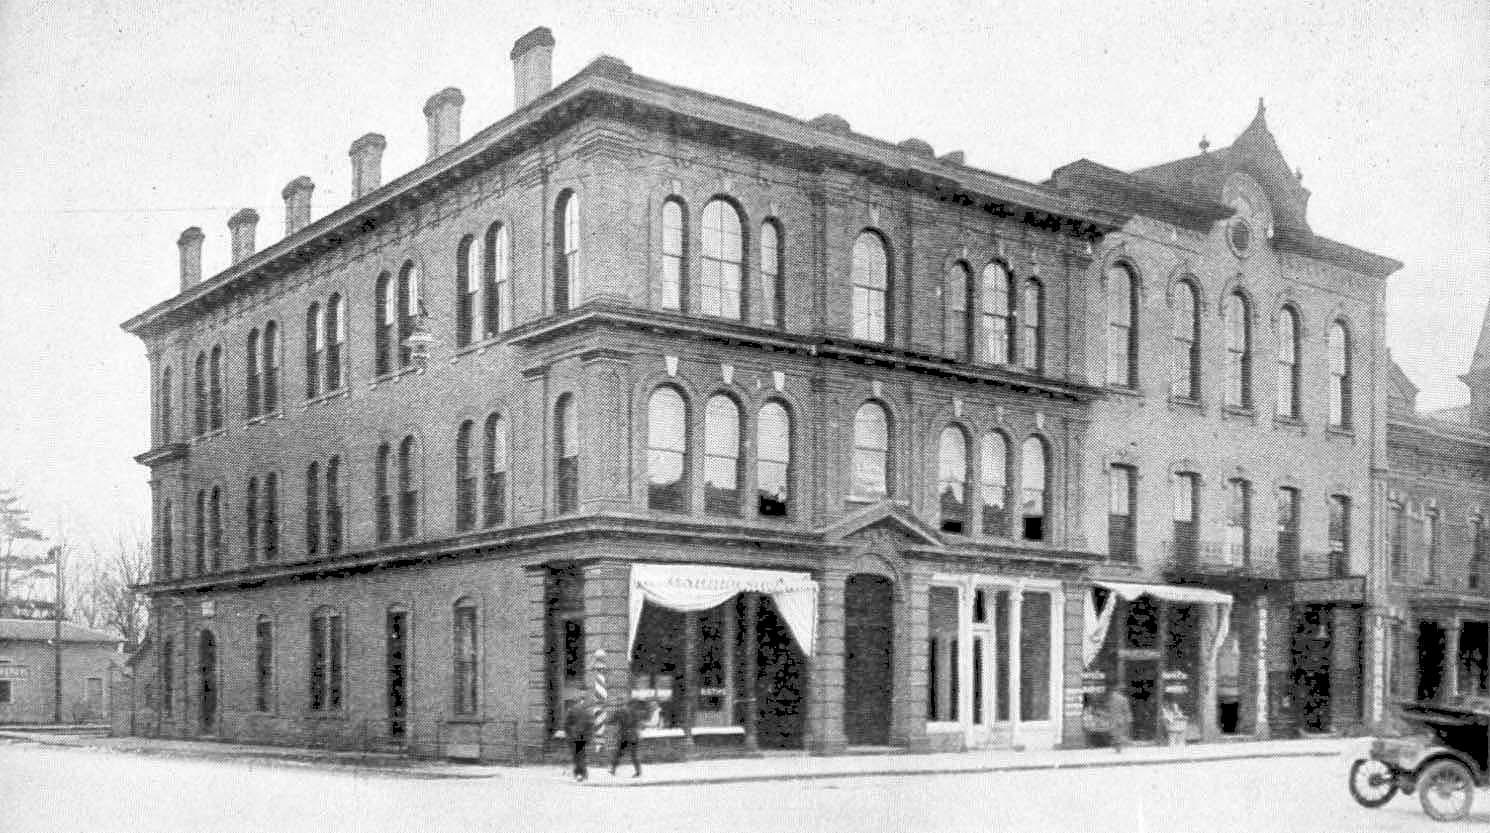 The Sutton block